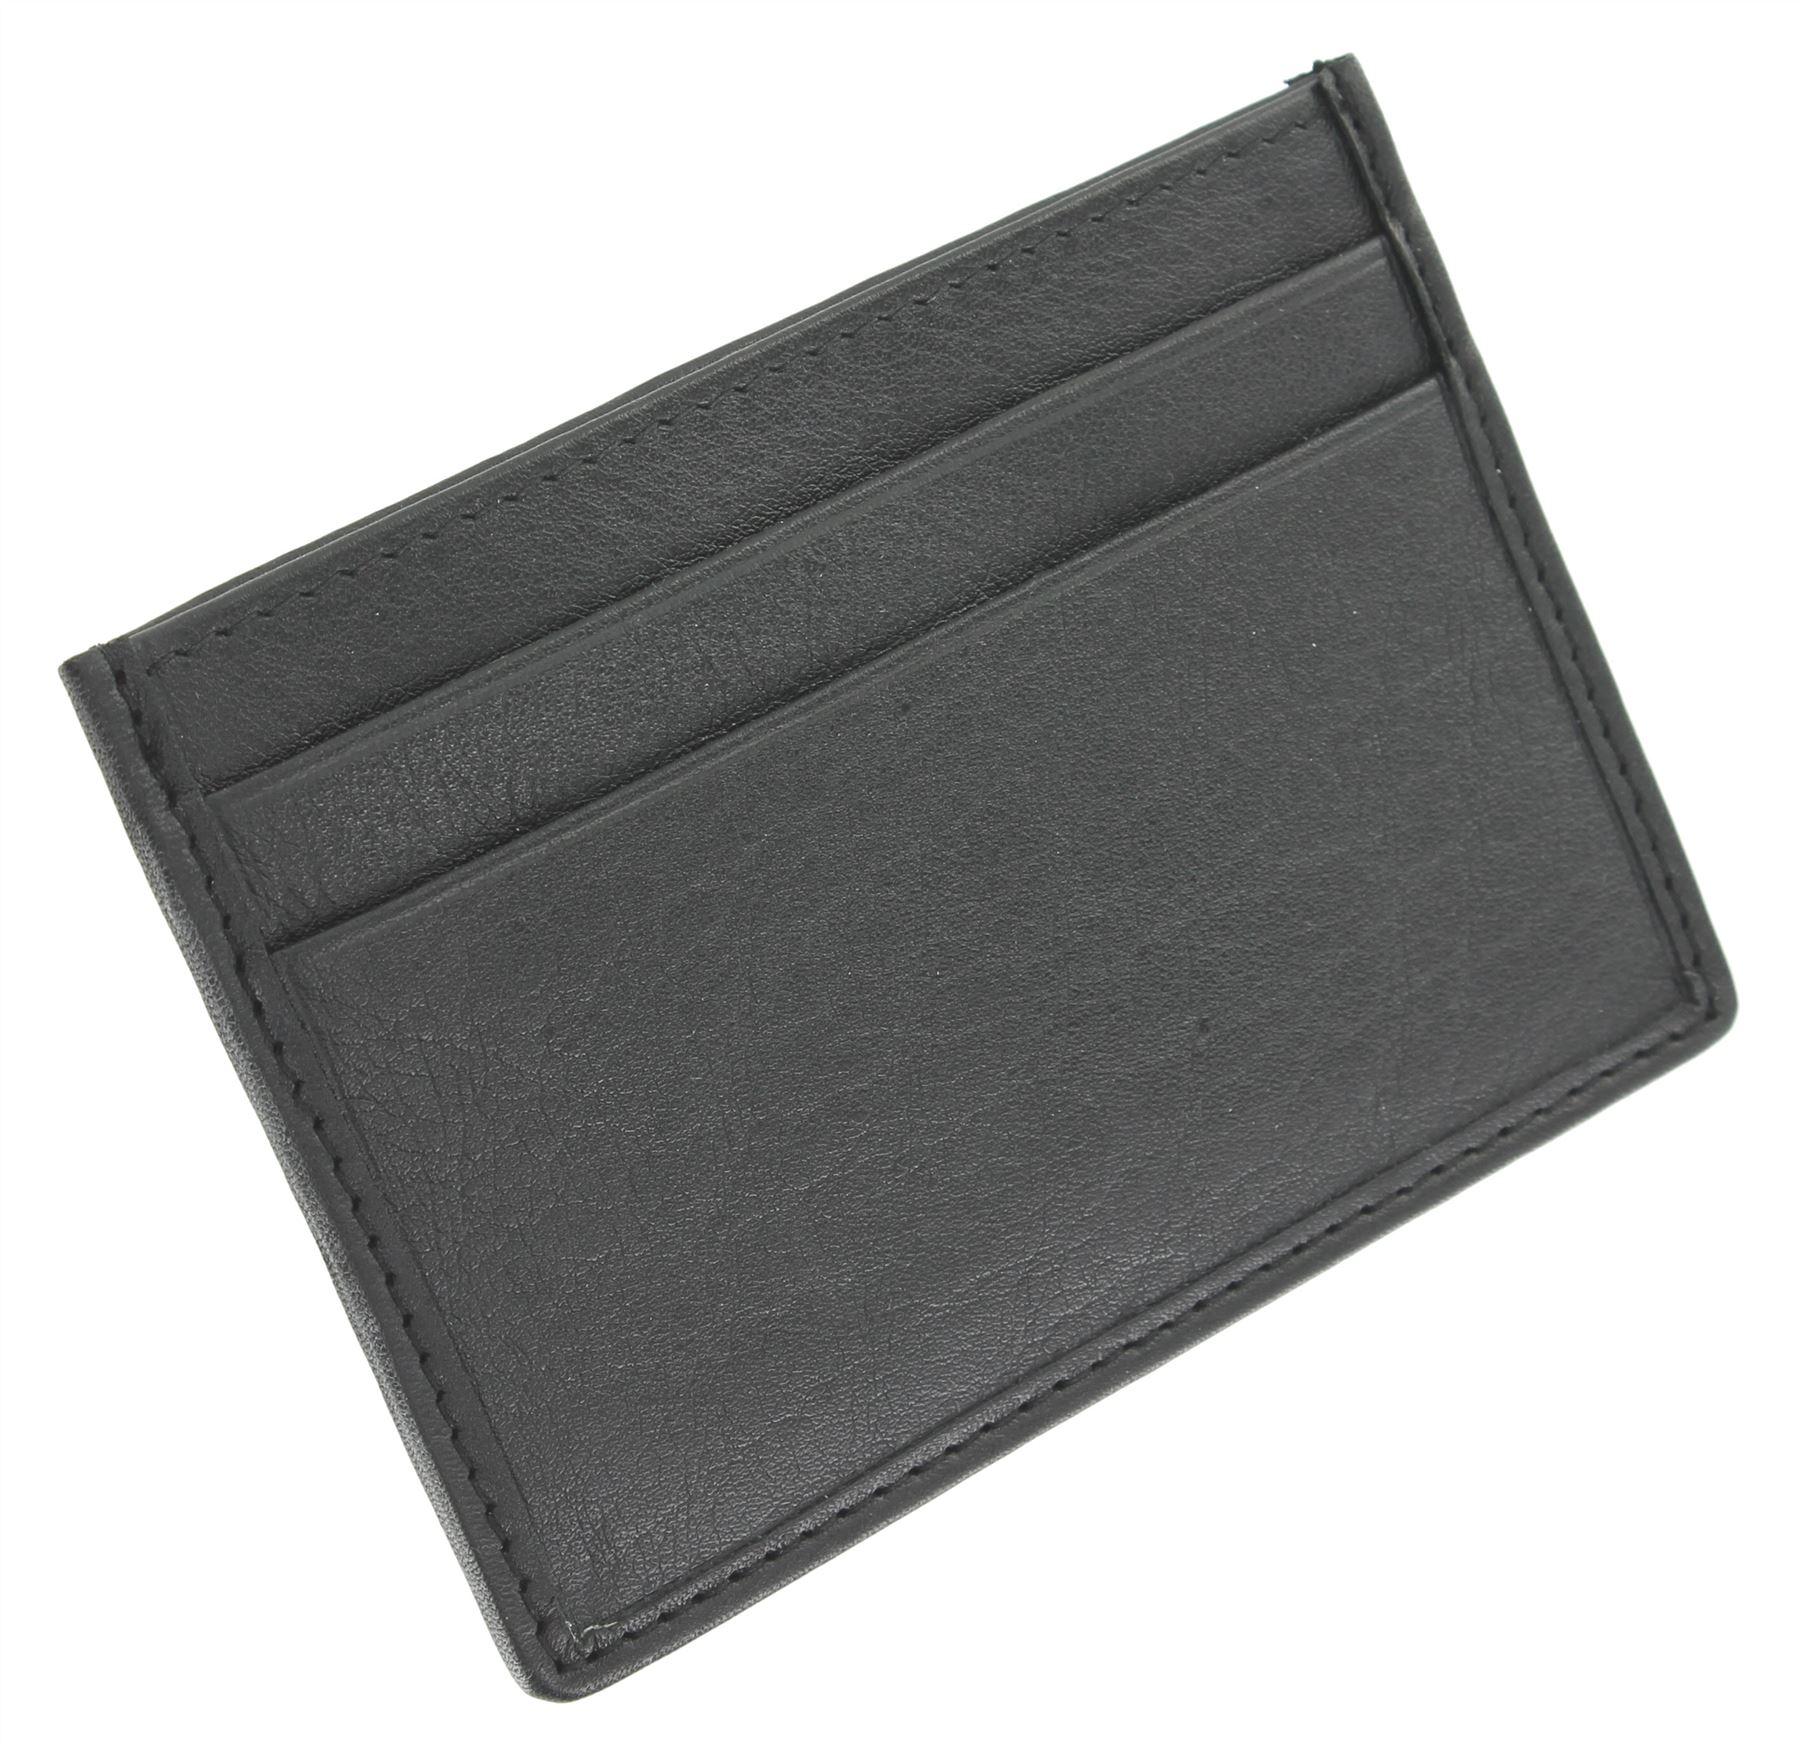 Mala Leather VERVE Collection Slim Leather Credit Card Holder 611/_26